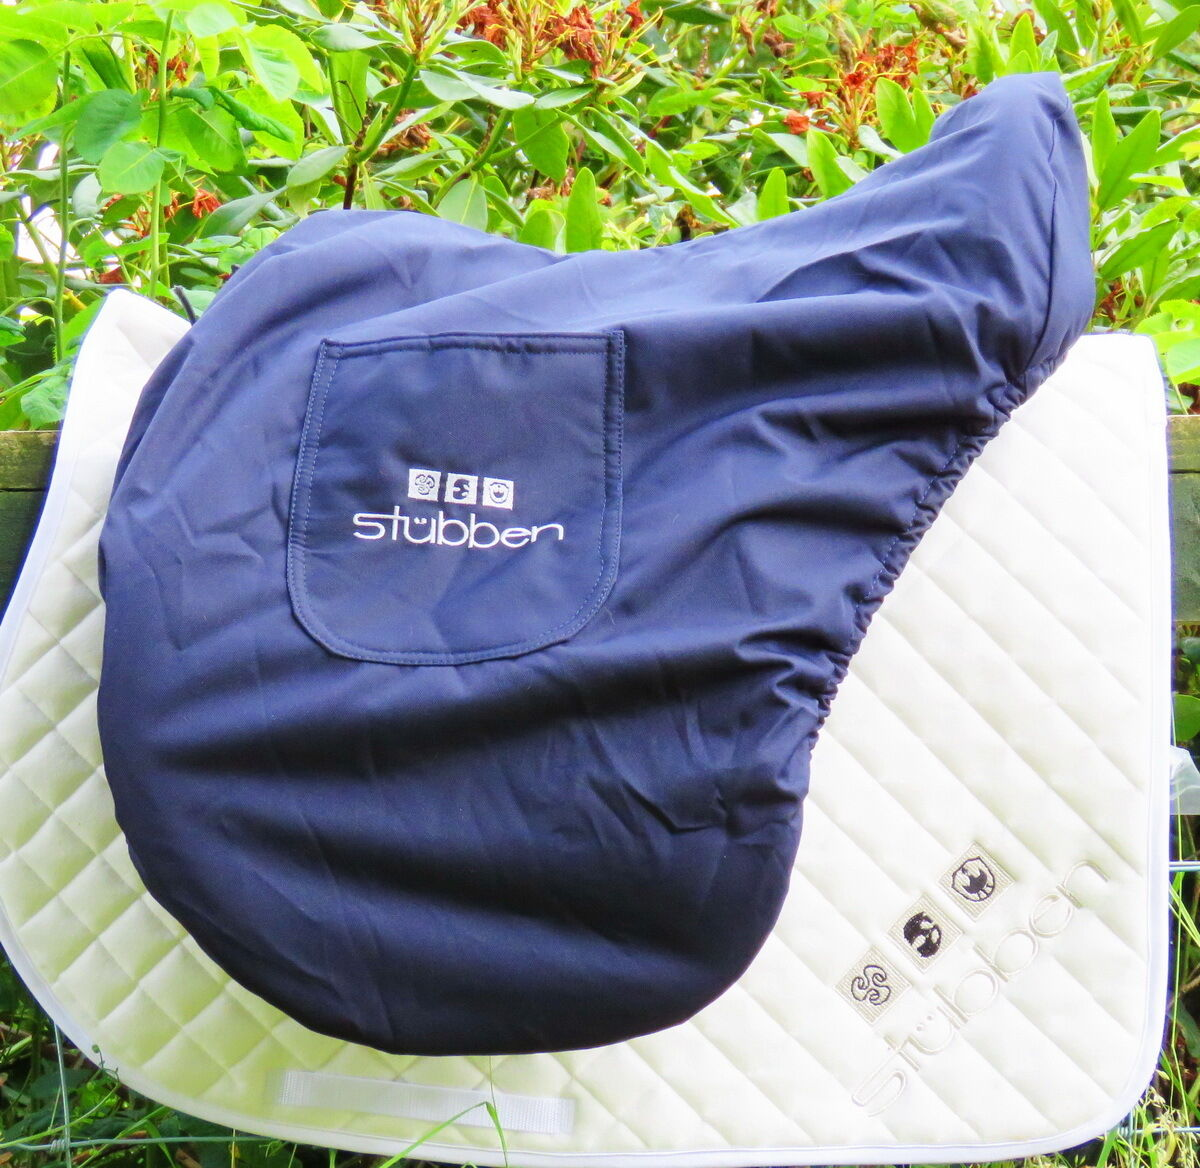 STUBBEN UNIQUE POSH Large WATERPROOF Saddle  Bag Cover DRESSAGE JUMPING GP VSD AP  we supply the best